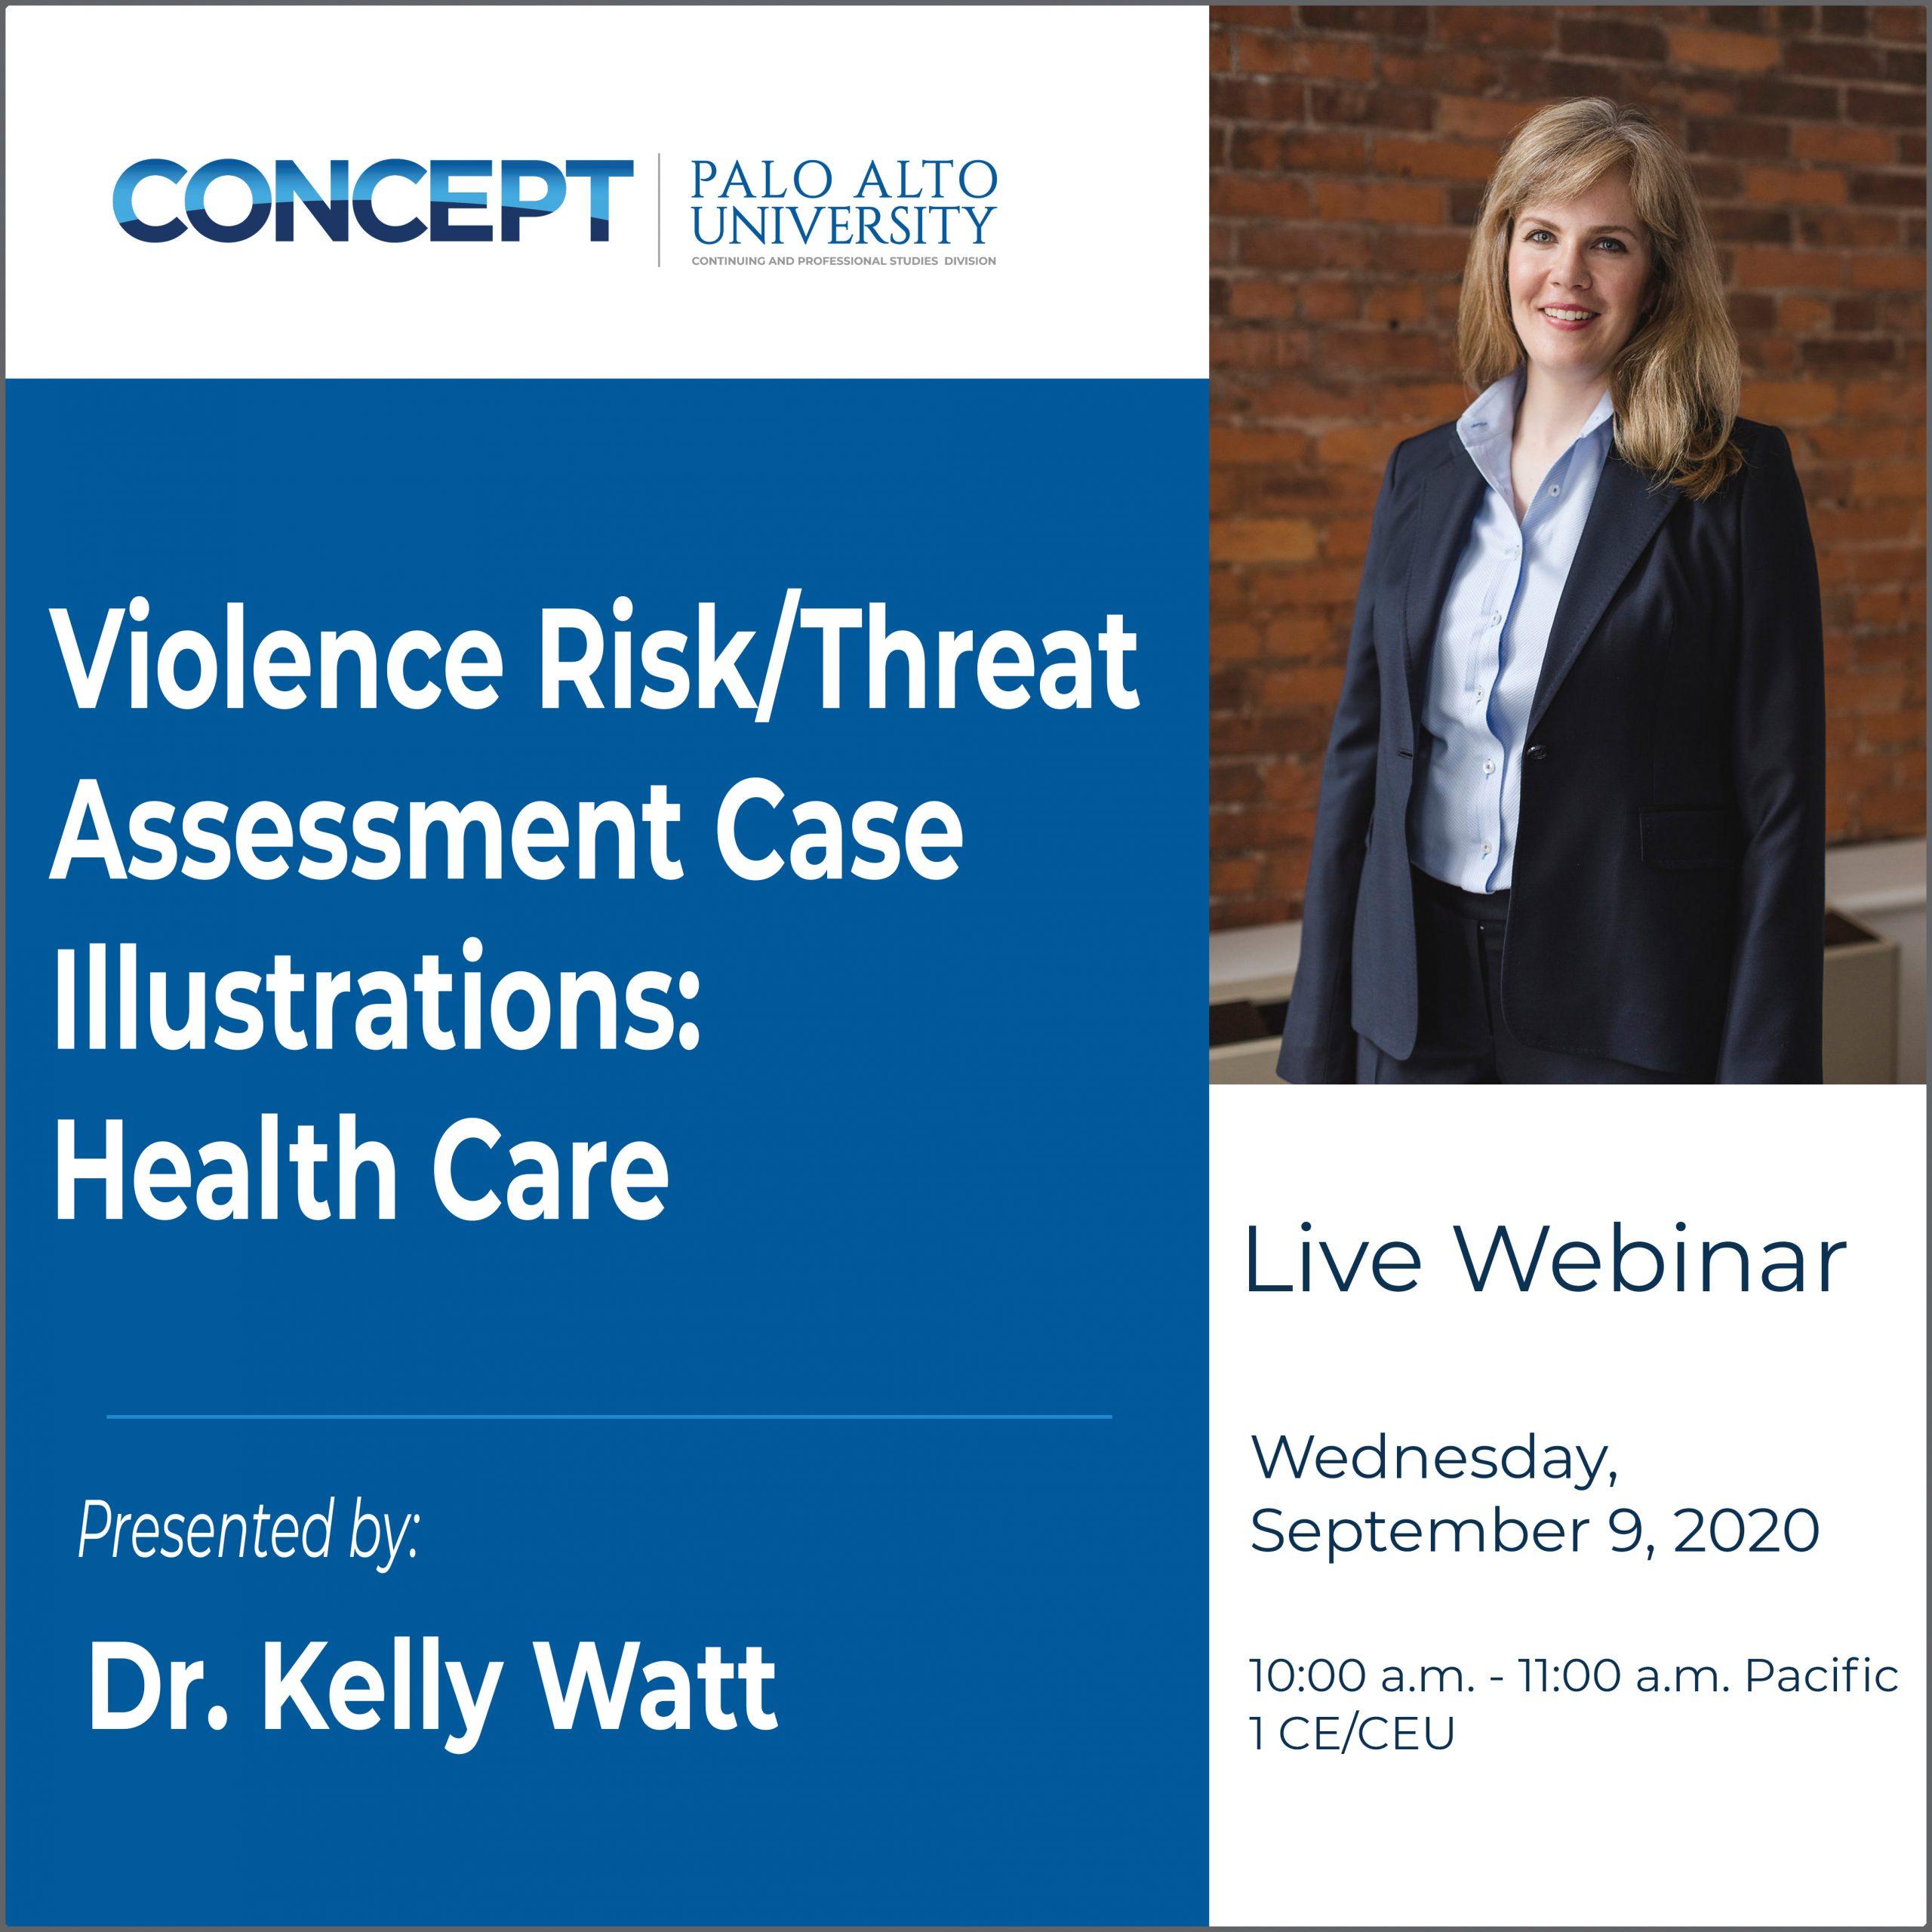 CONCEPT Violence Risk Assessment Dr Kelly Watt Sept 9 2020